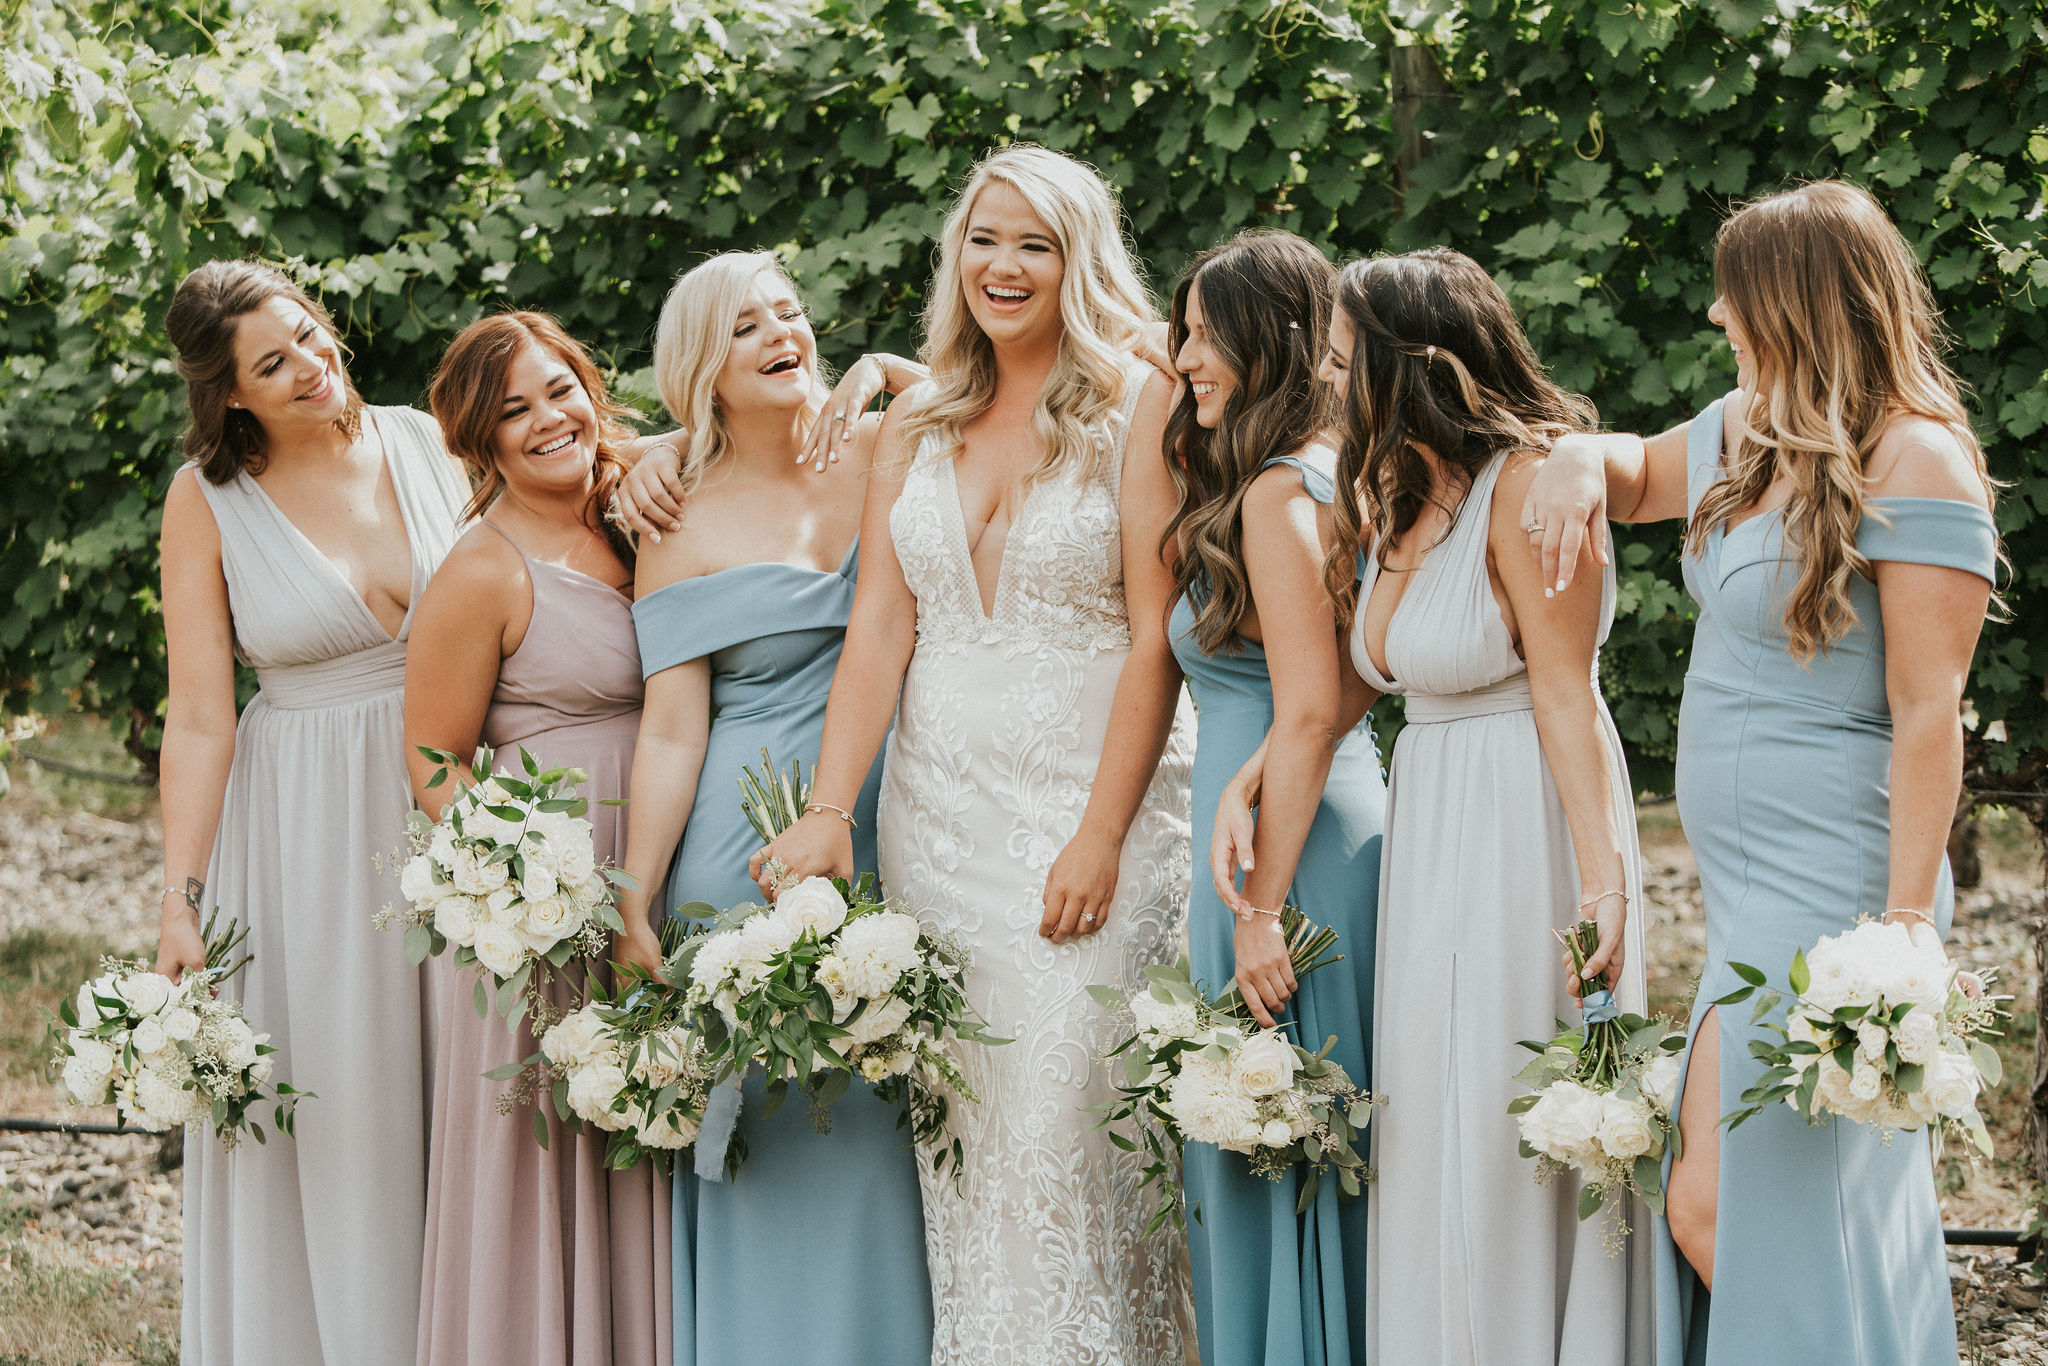 Bride tribe- Bouquets